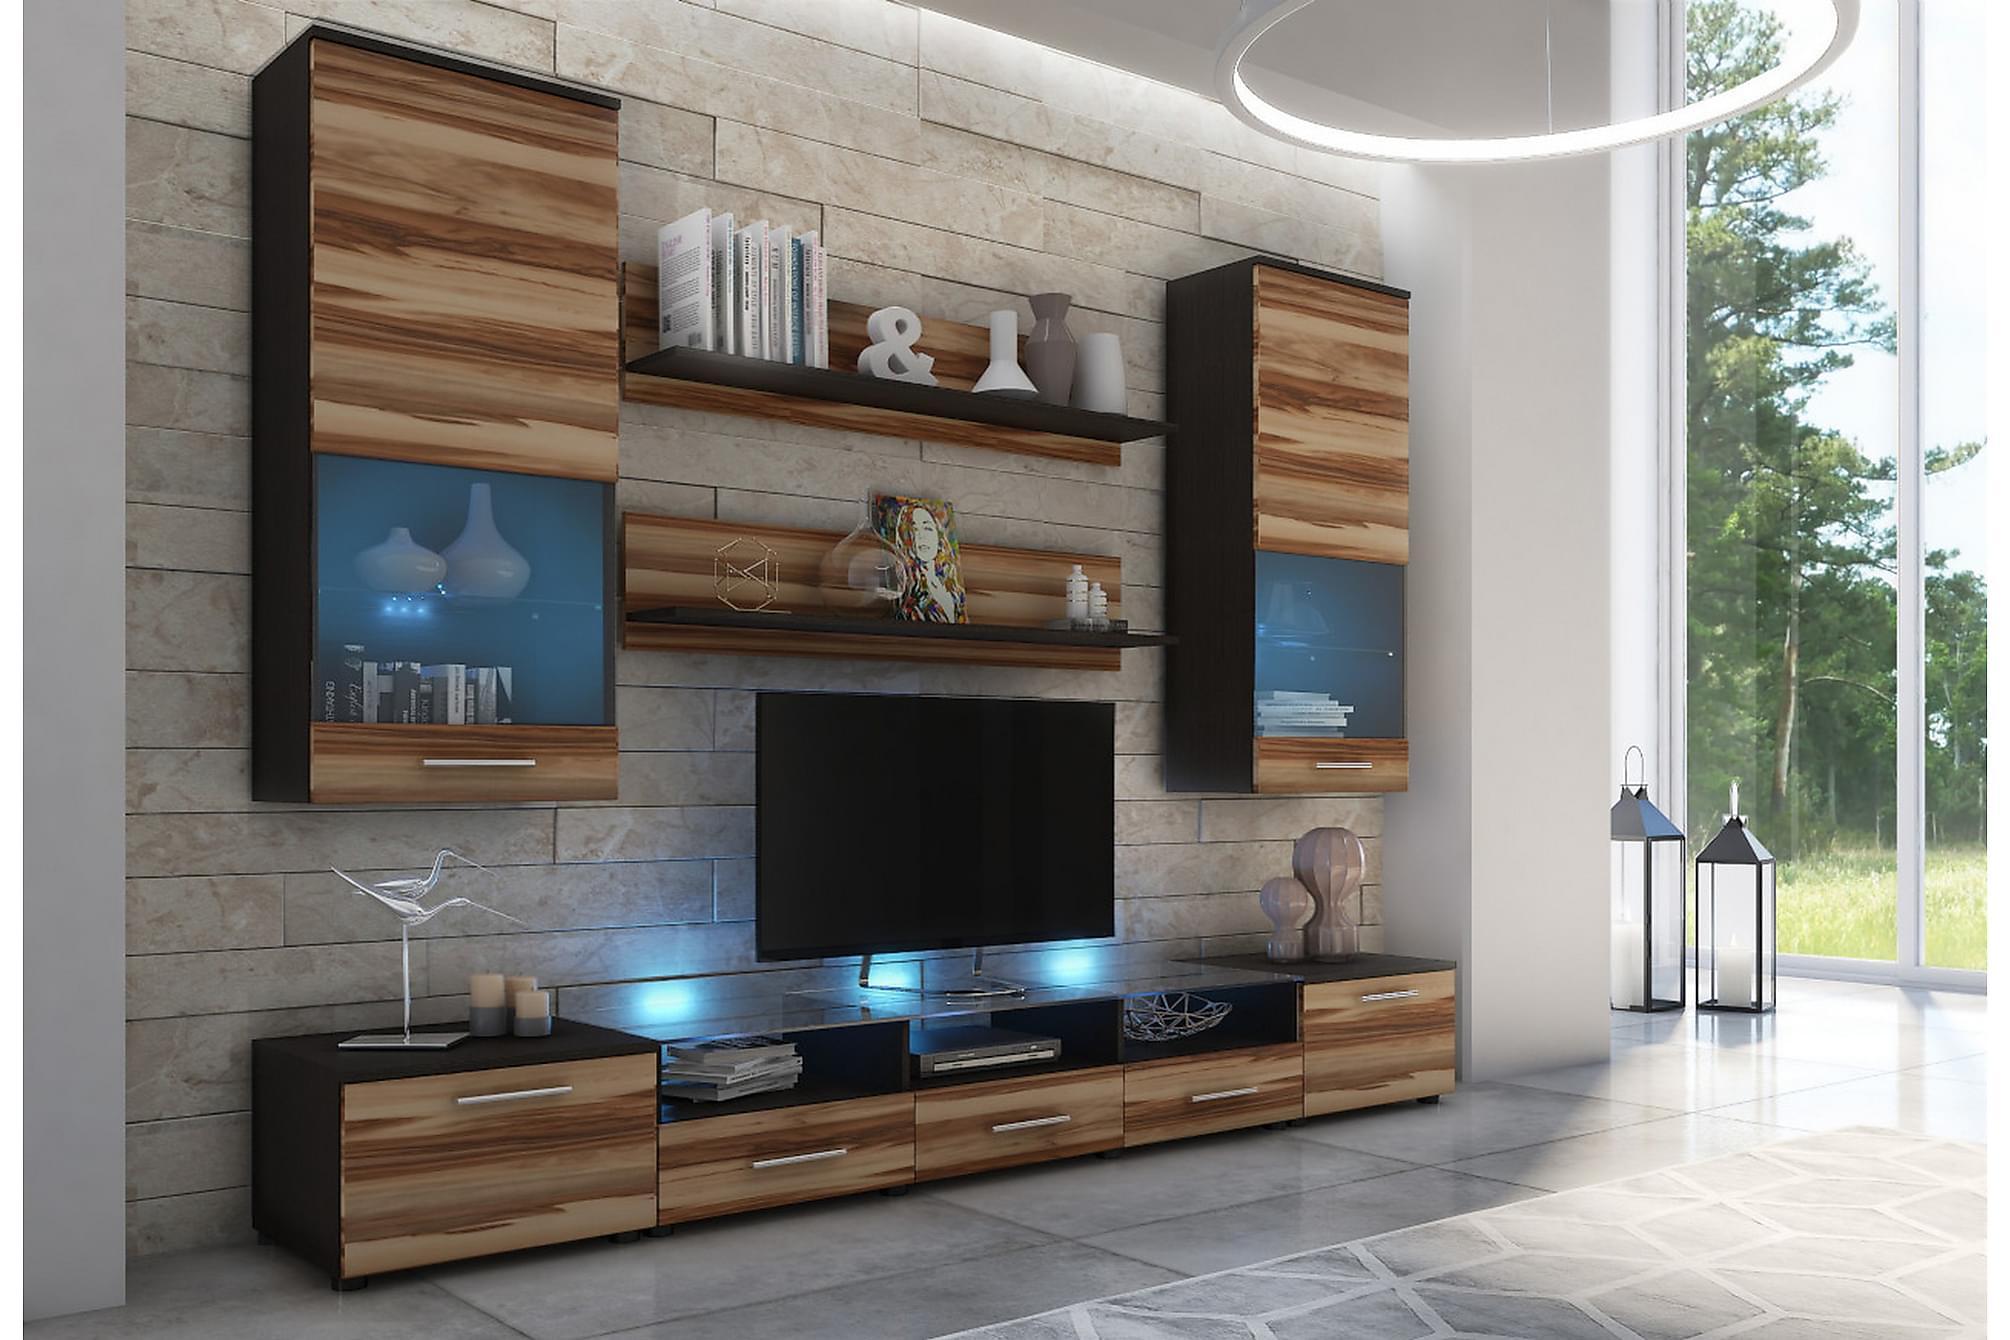 CAMA Vardagsrumsset 42x250 cm LED-belysning Wenge/Valnöt Blå, Möbelset för vardagsrum